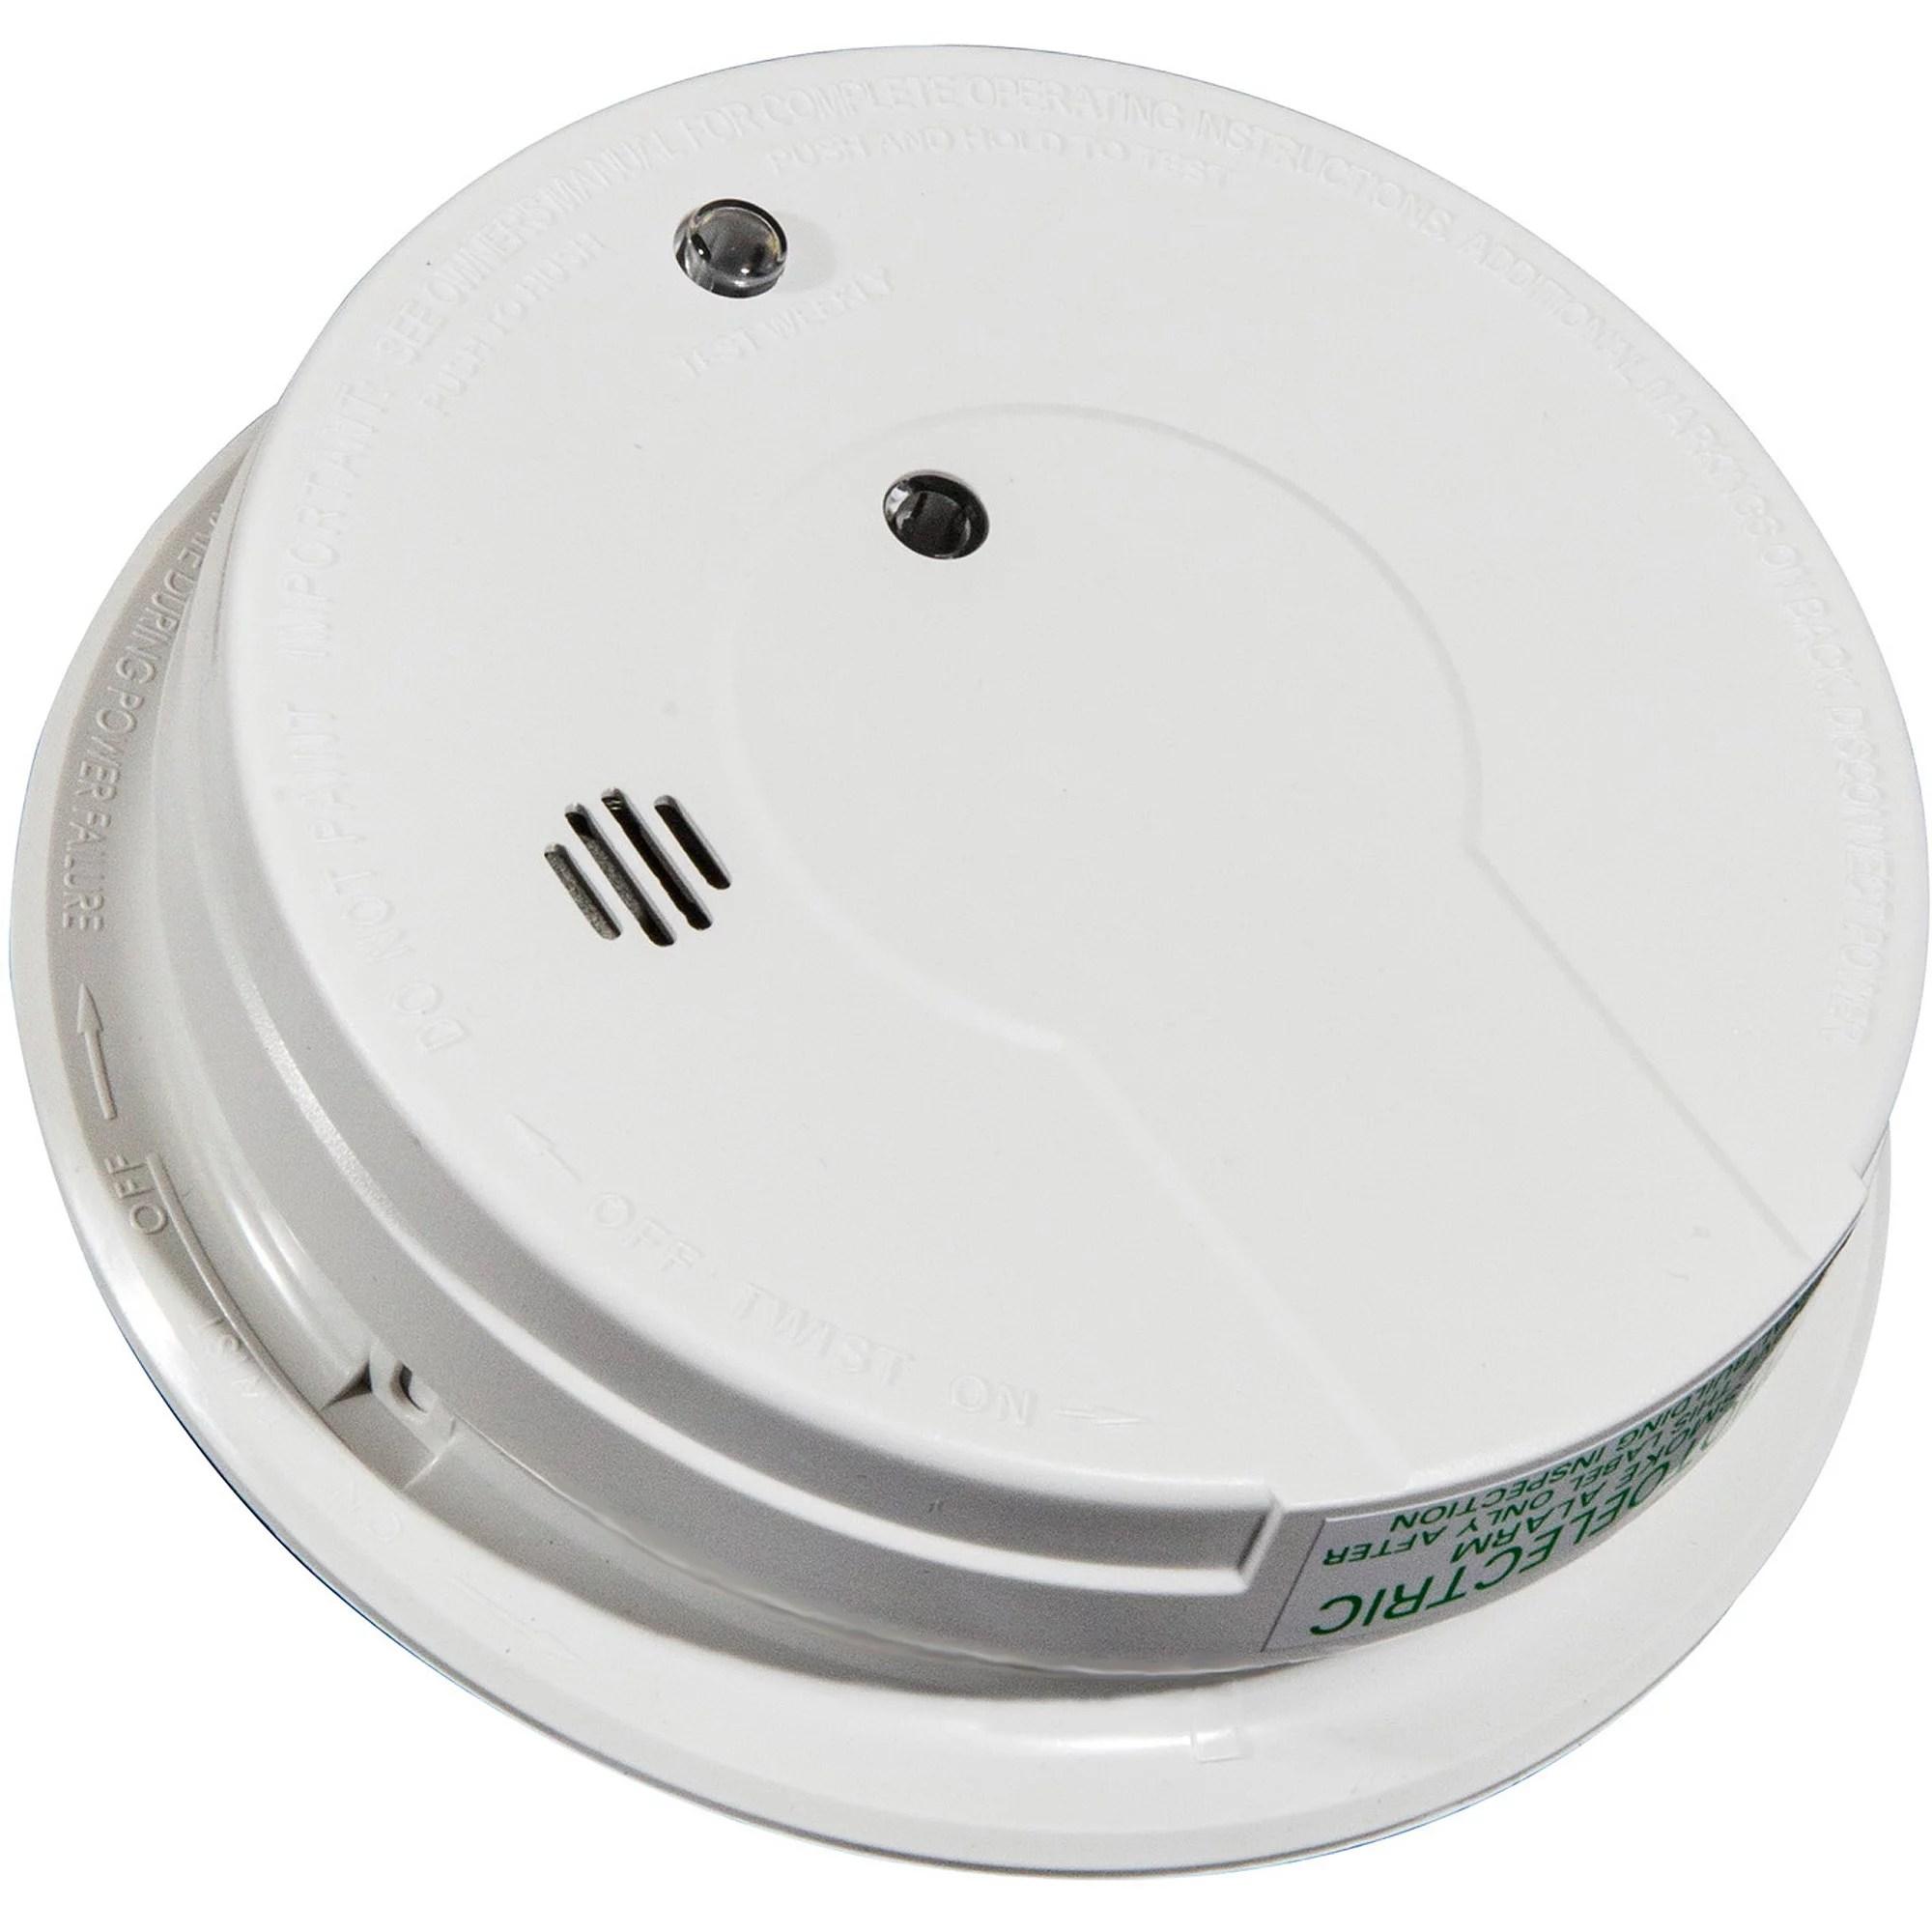 kidde smoke alarm wiring diagram raynor garage door sensor old 36